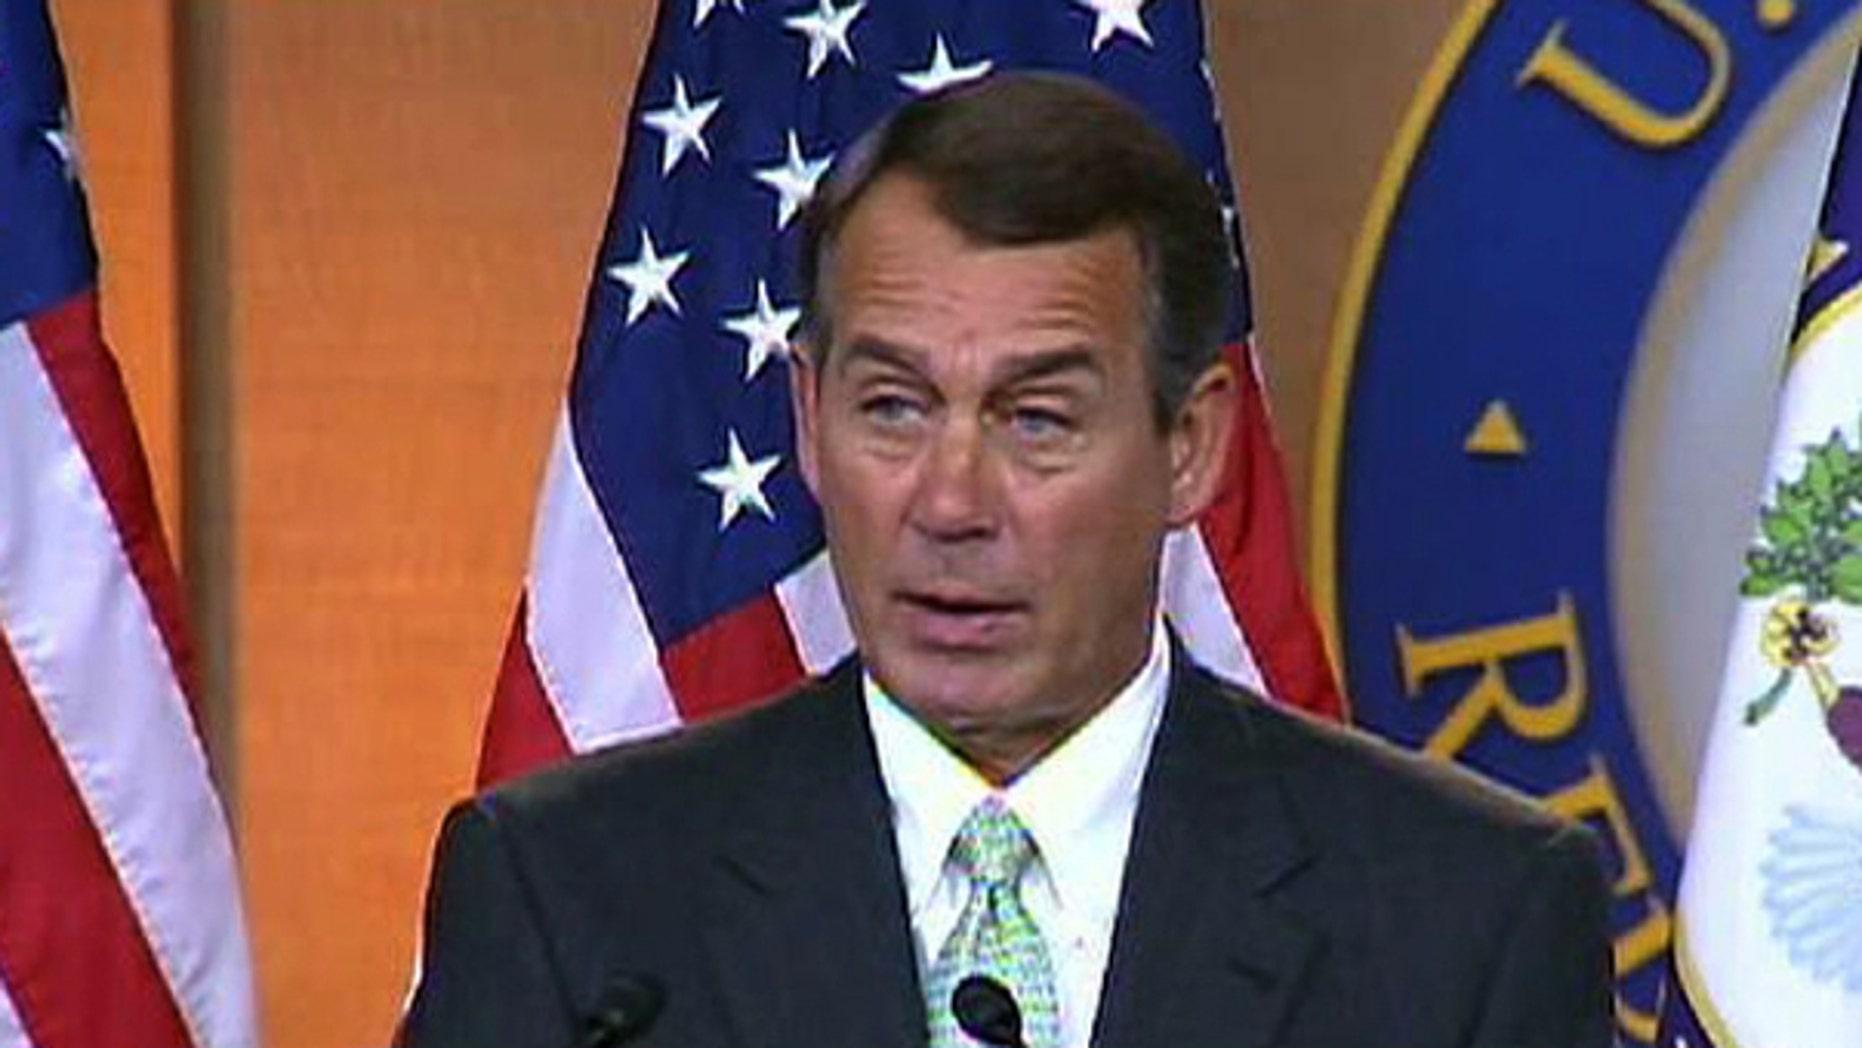 House Minority Leader John Boehner criticizes Democrats' economic proposals at a news conference, Friday, Dec. 4, 2009. (FNC)